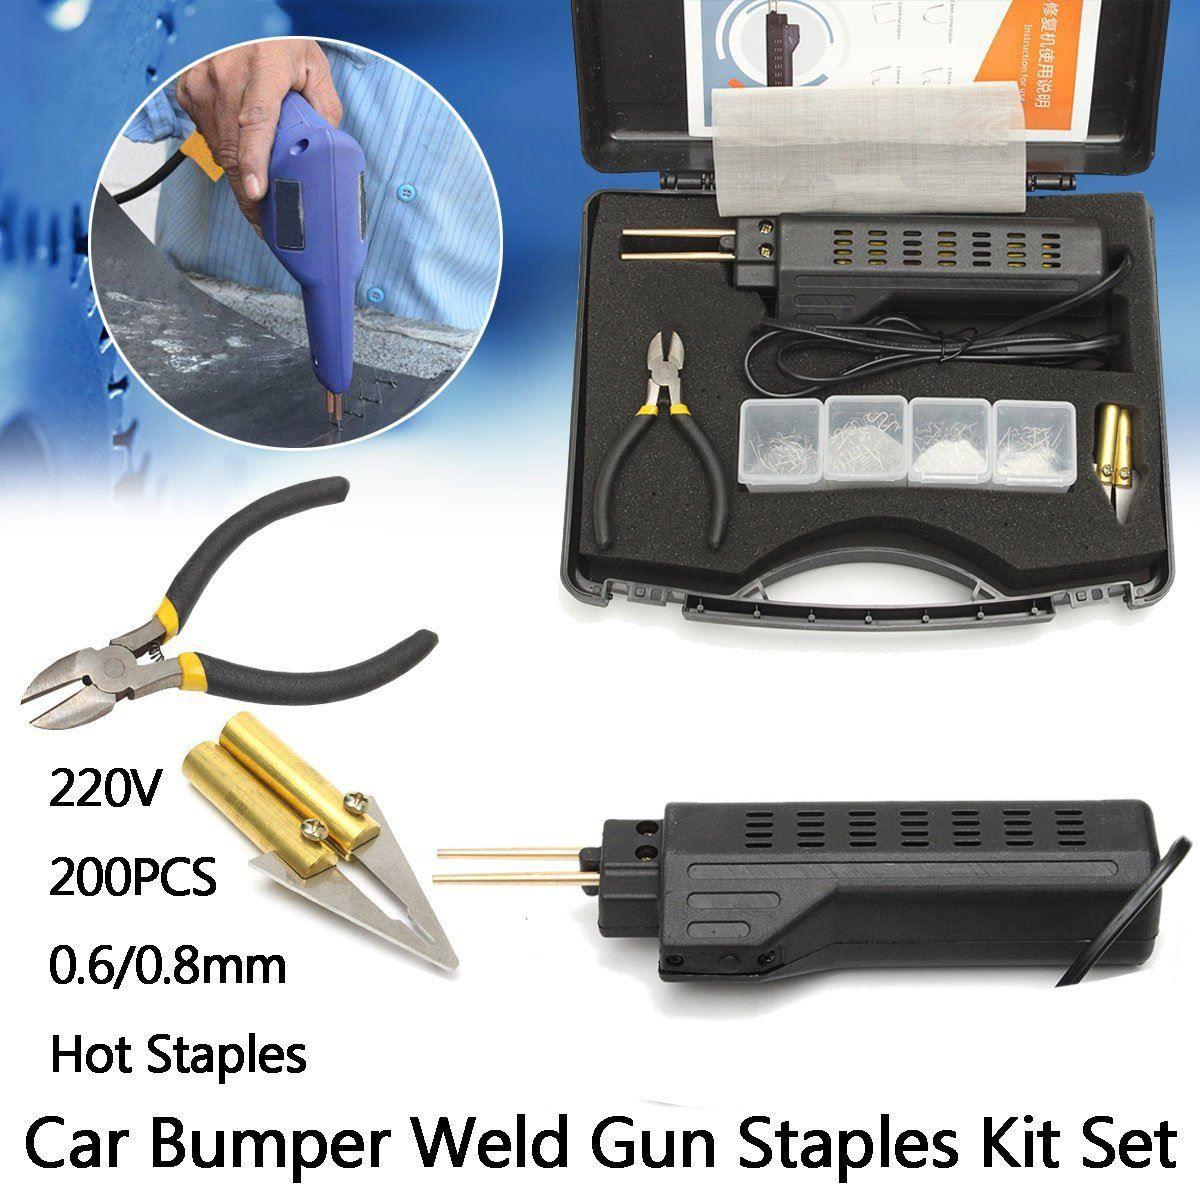 220-250V Hot Stapler Car Bumper Plastic Welding Torch Fairing Auto Body Tool Welder Machine 0.6/0.8mm + 200 Staples